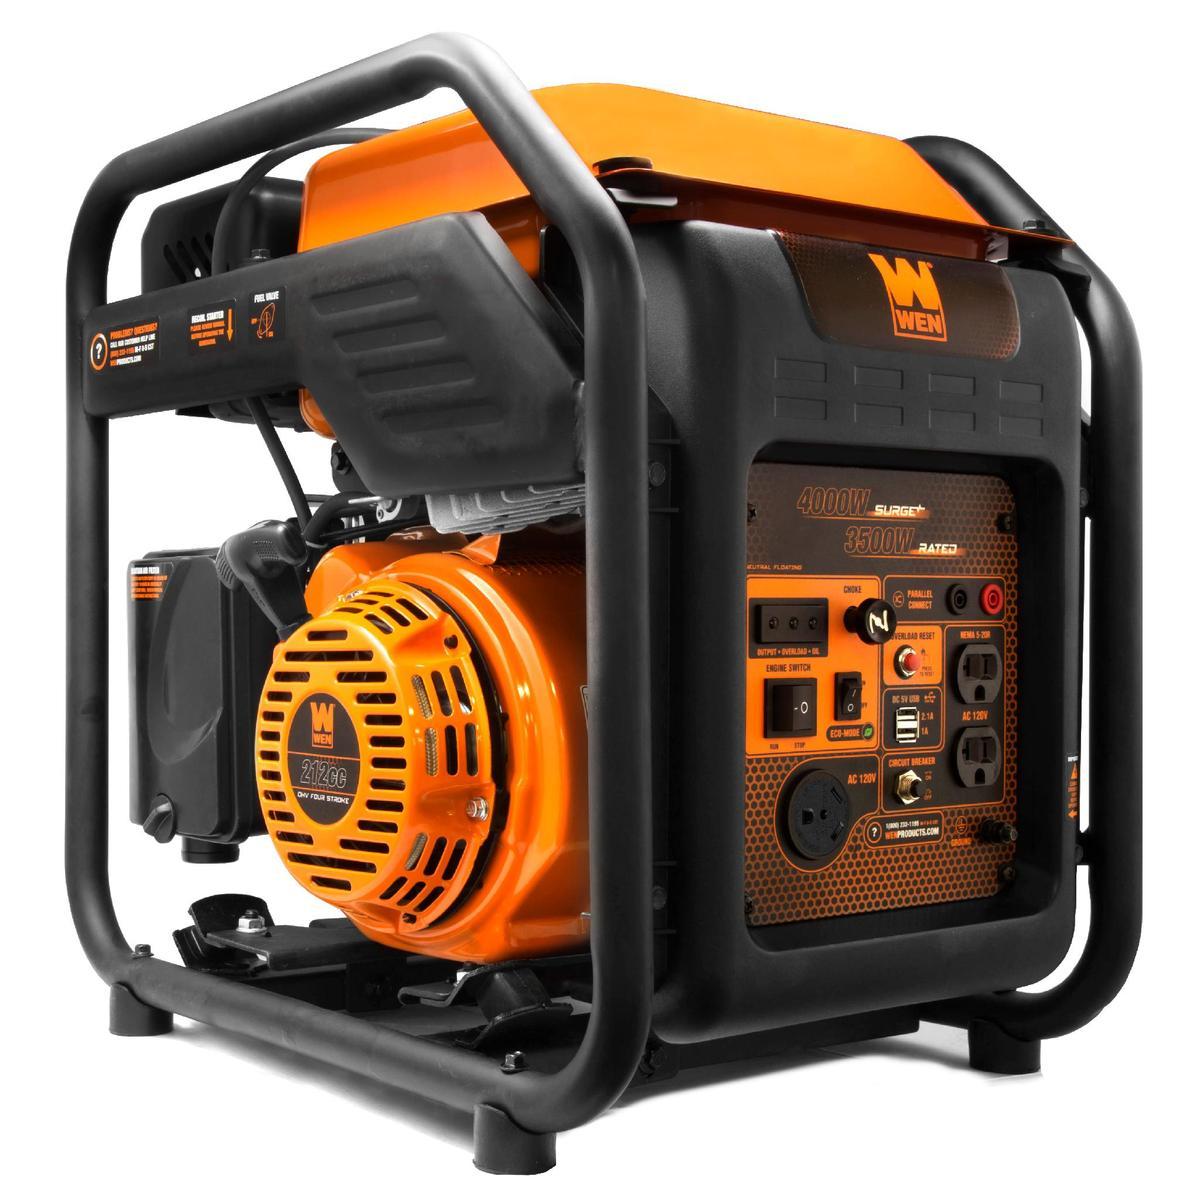 WEN GN400i RV-Ready 4000-Watt Open Frame Inverter Generator, CARB Compliant - Back in Stock - FS $393.81